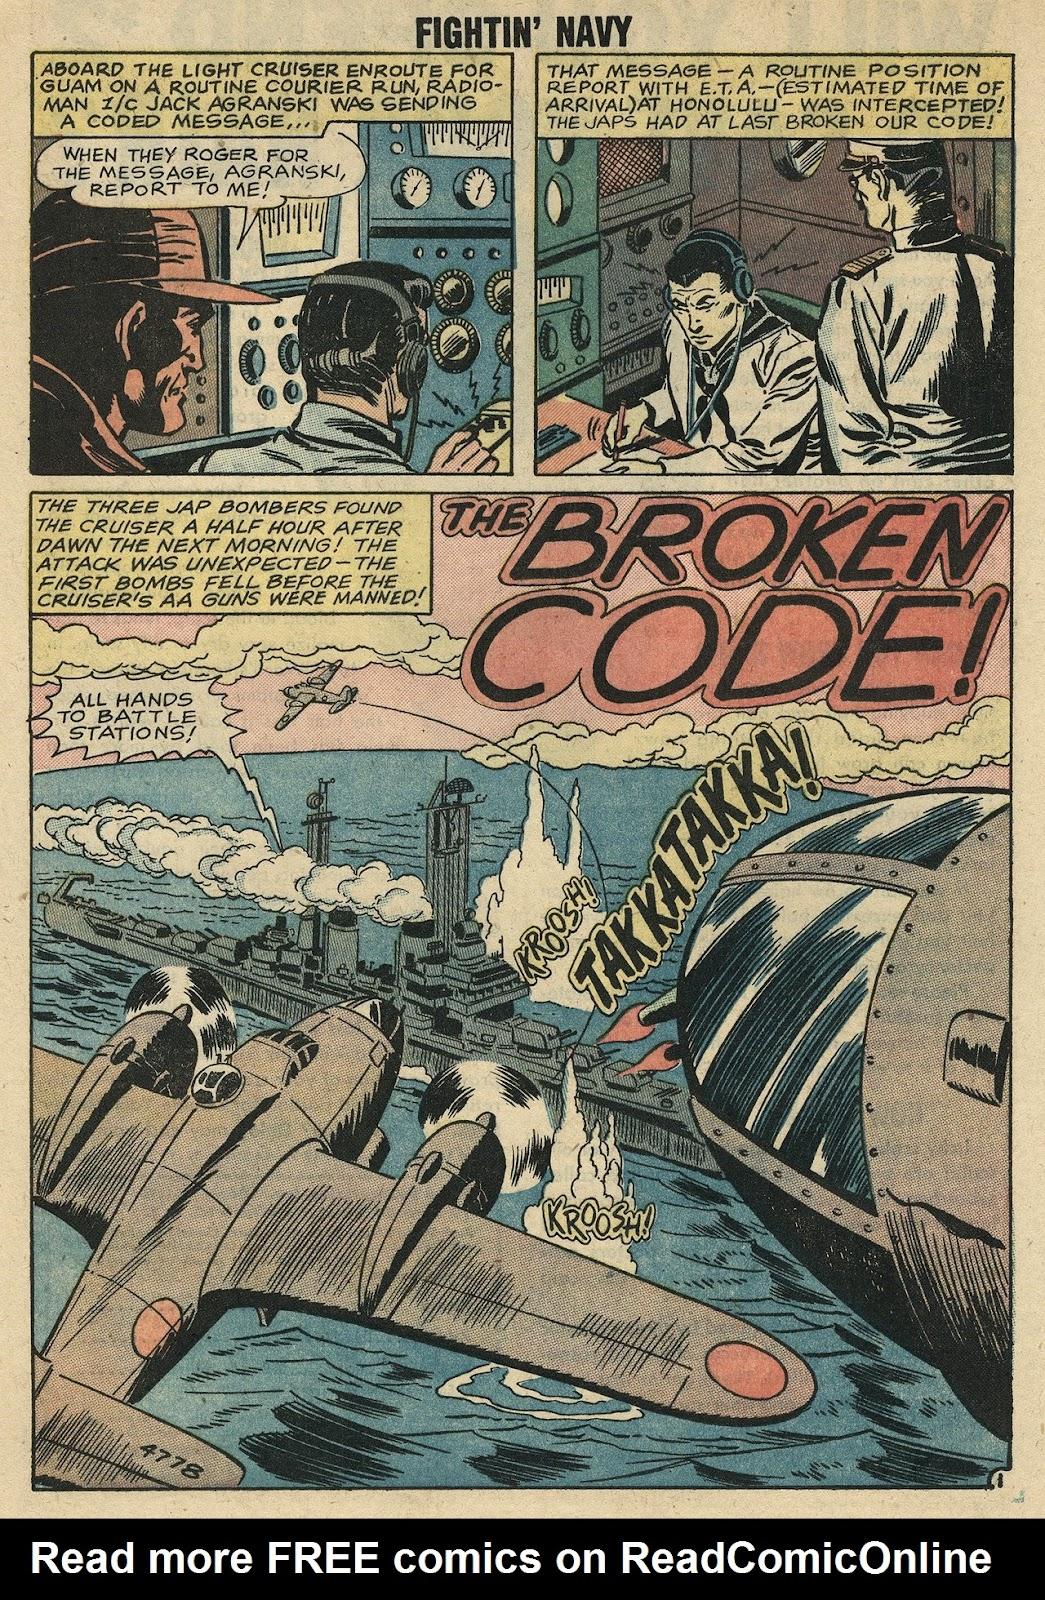 Read online Fightin' Navy comic -  Issue #86 - 20